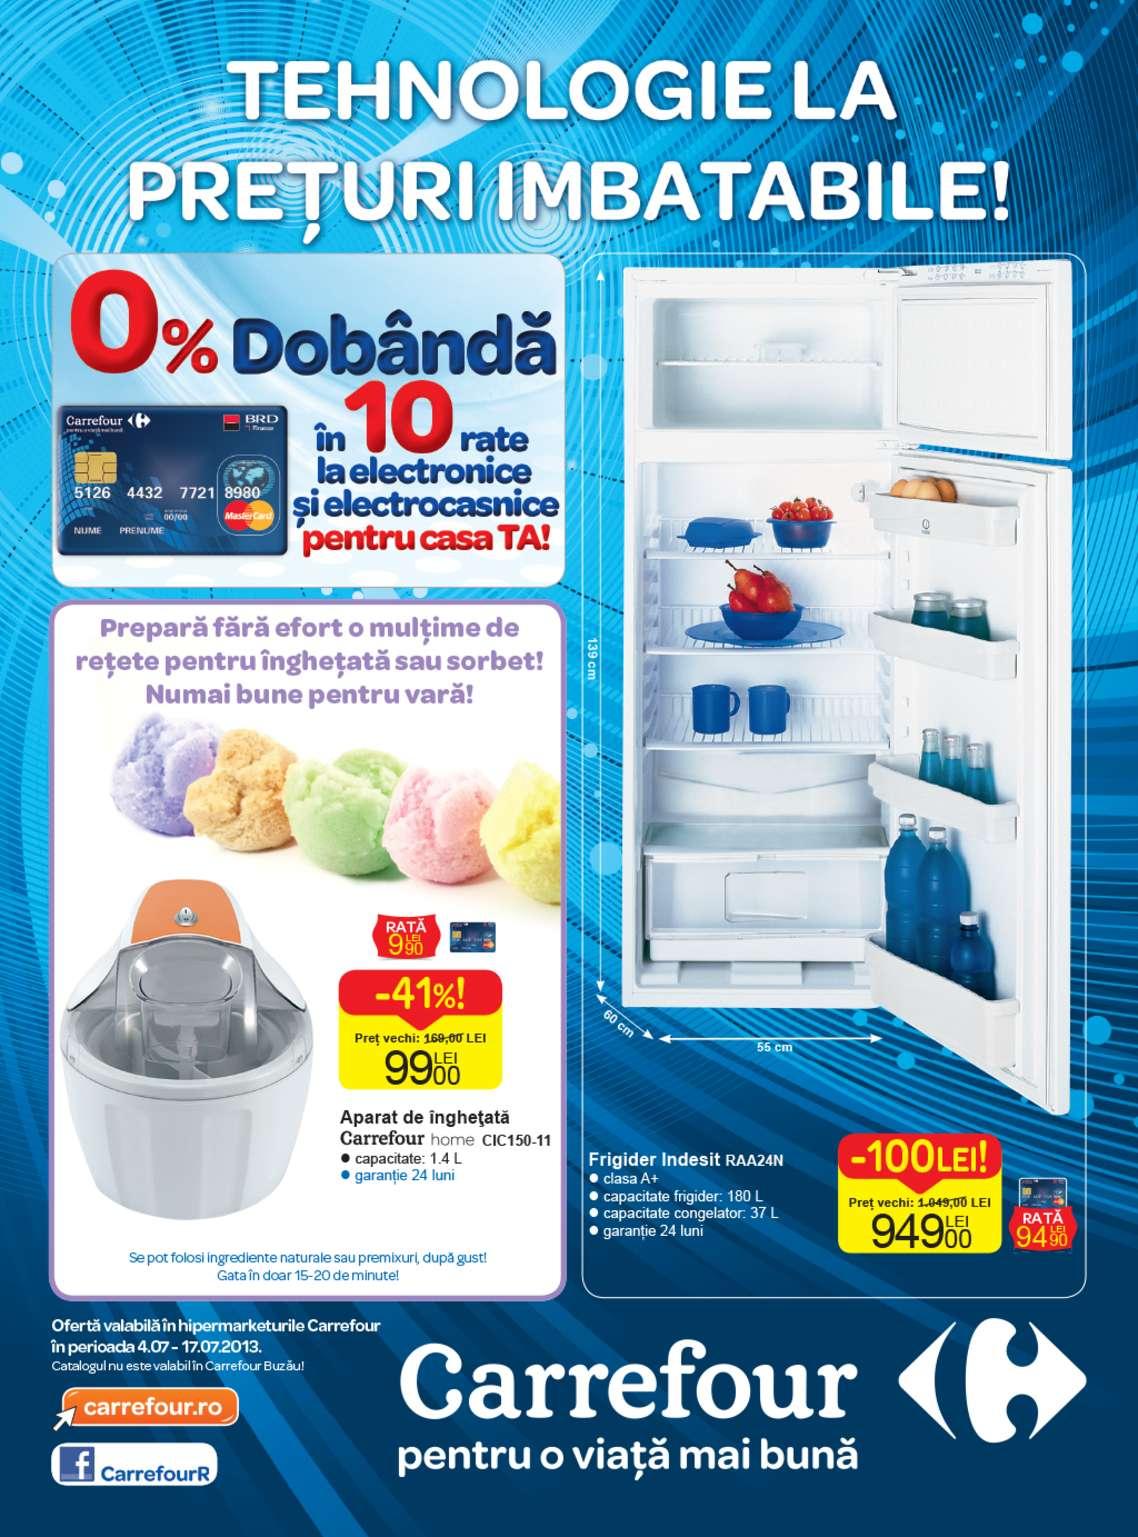 Catalog Oferte Si Promotii Oferta Carrefour Iasi Iulie 2013